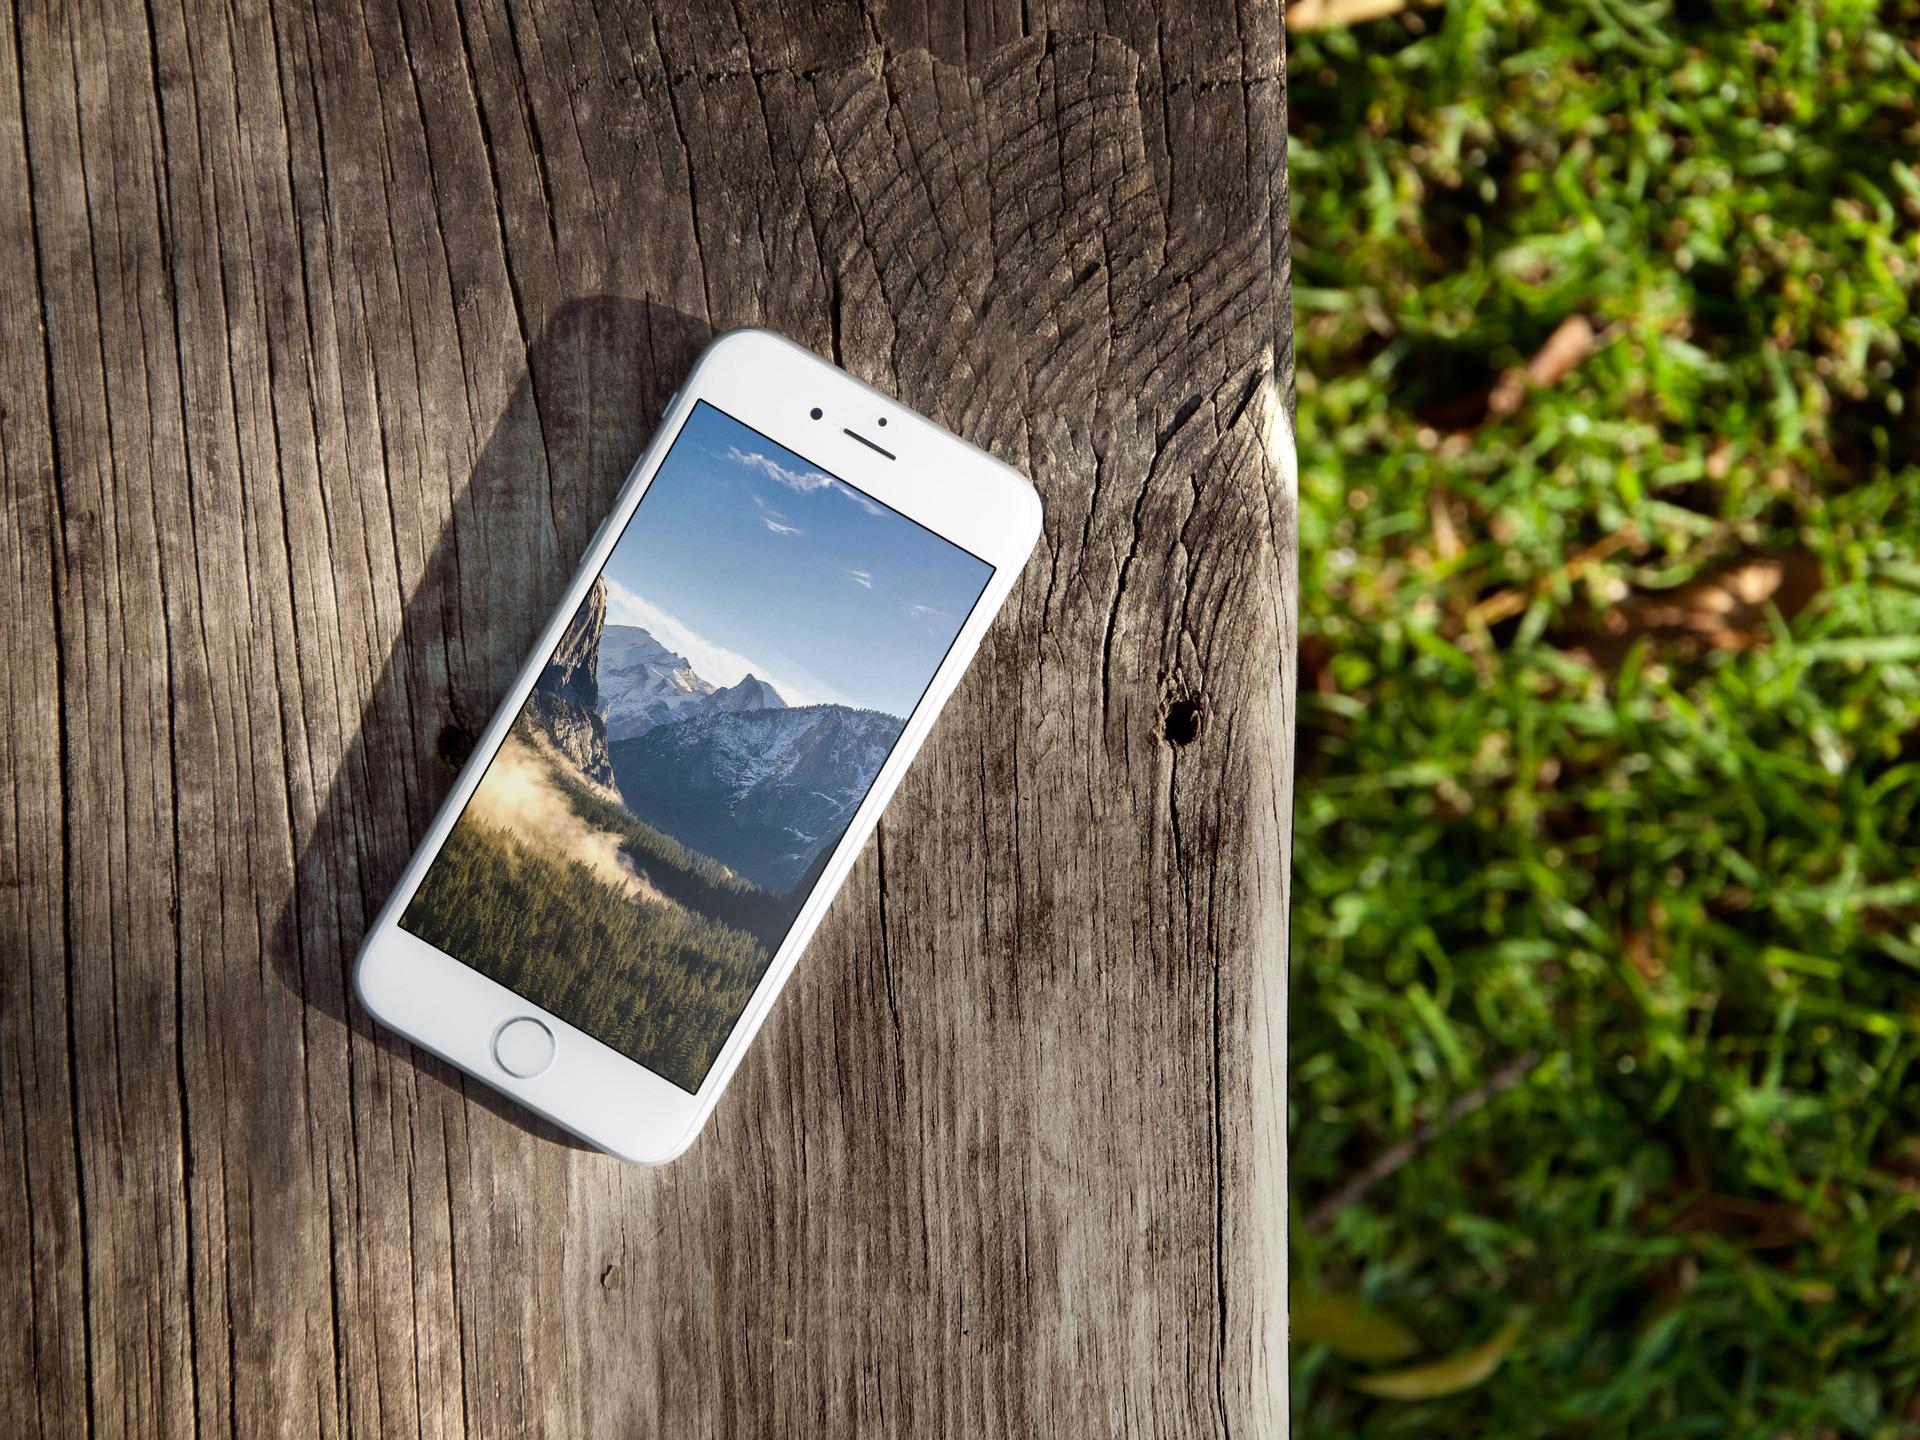 wallpaper-yosemite-mountain-nature-34-iphone6-plus-wallpaper splash